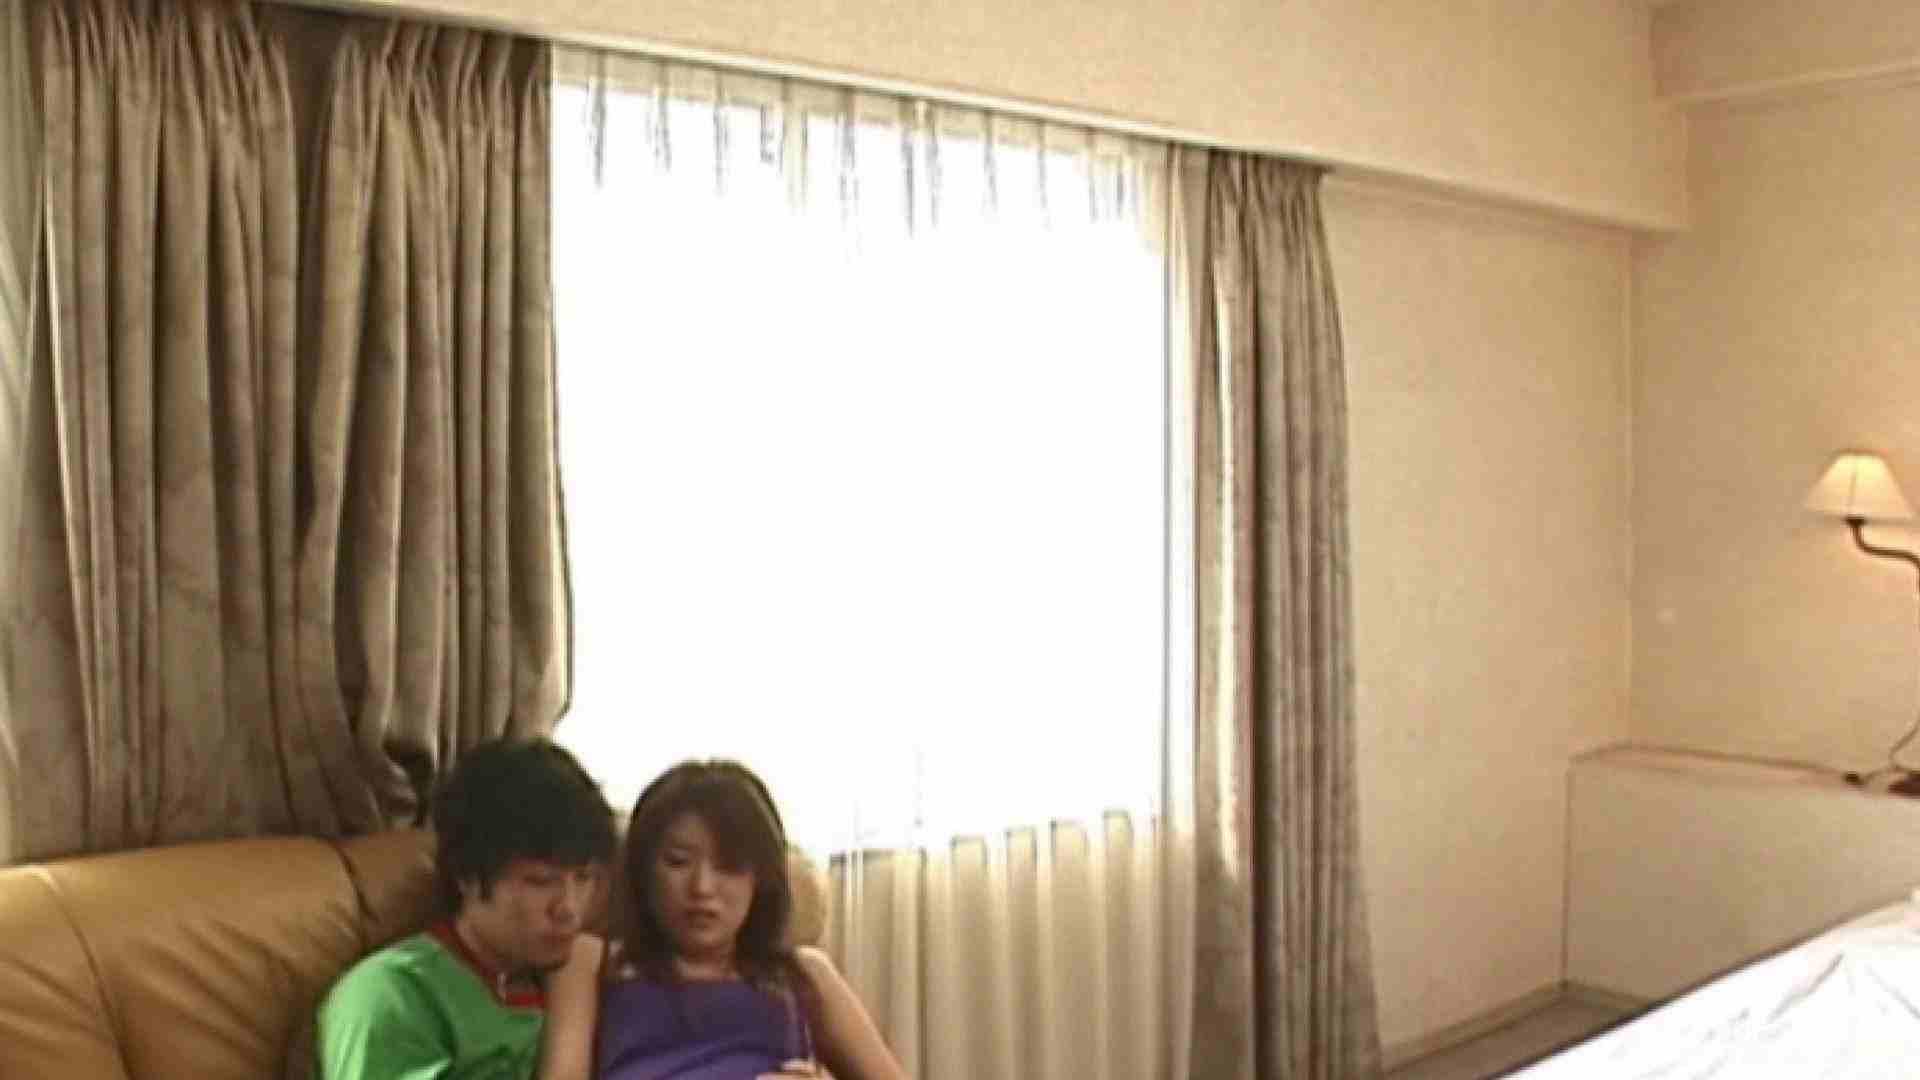 S級厳選美女ビッチガールVol.53 OLヌード天国 のぞき動画画像 95PIX 32